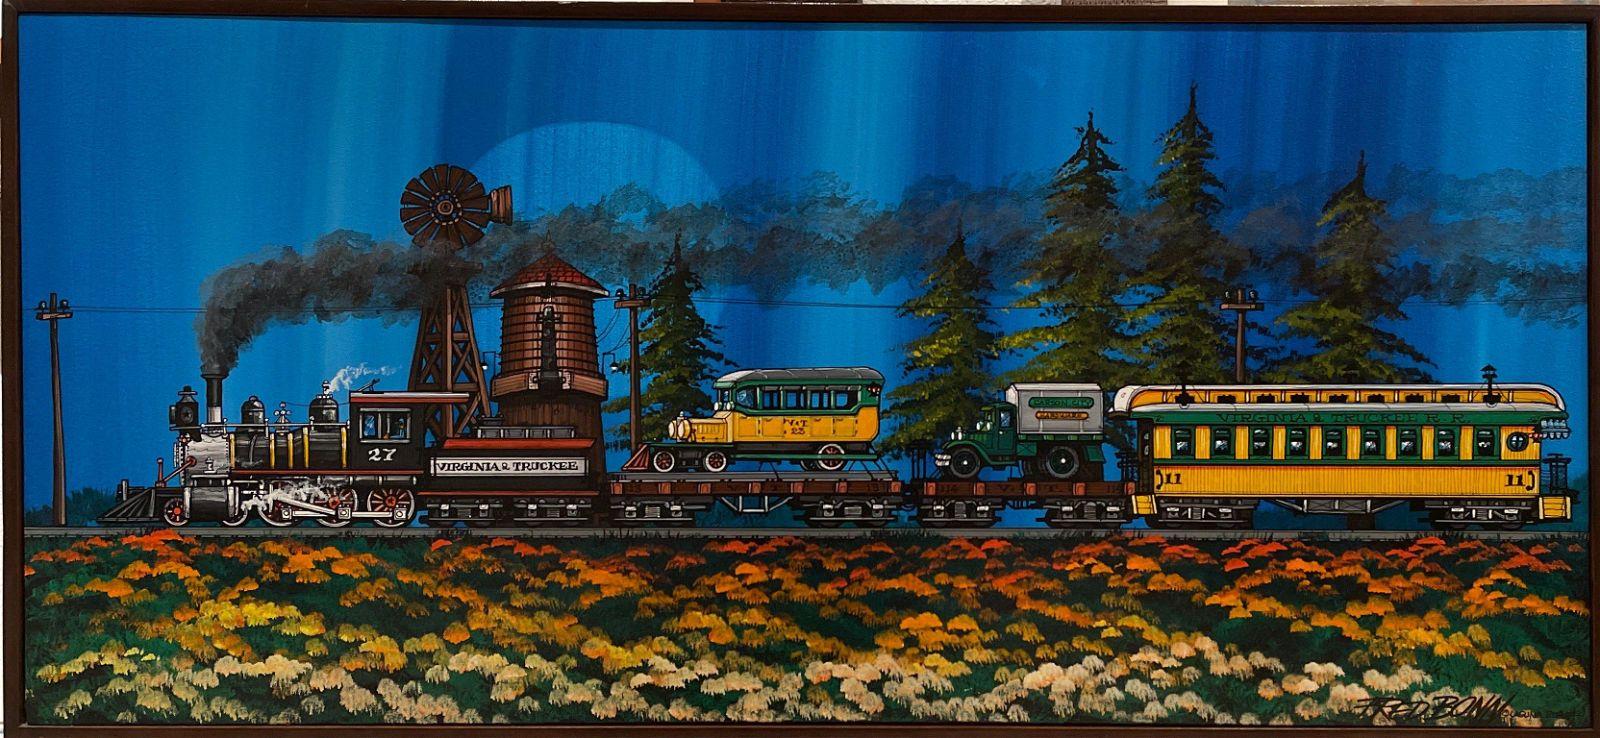 Fred Bonn (Virginia & Truckee Train) Signed Original